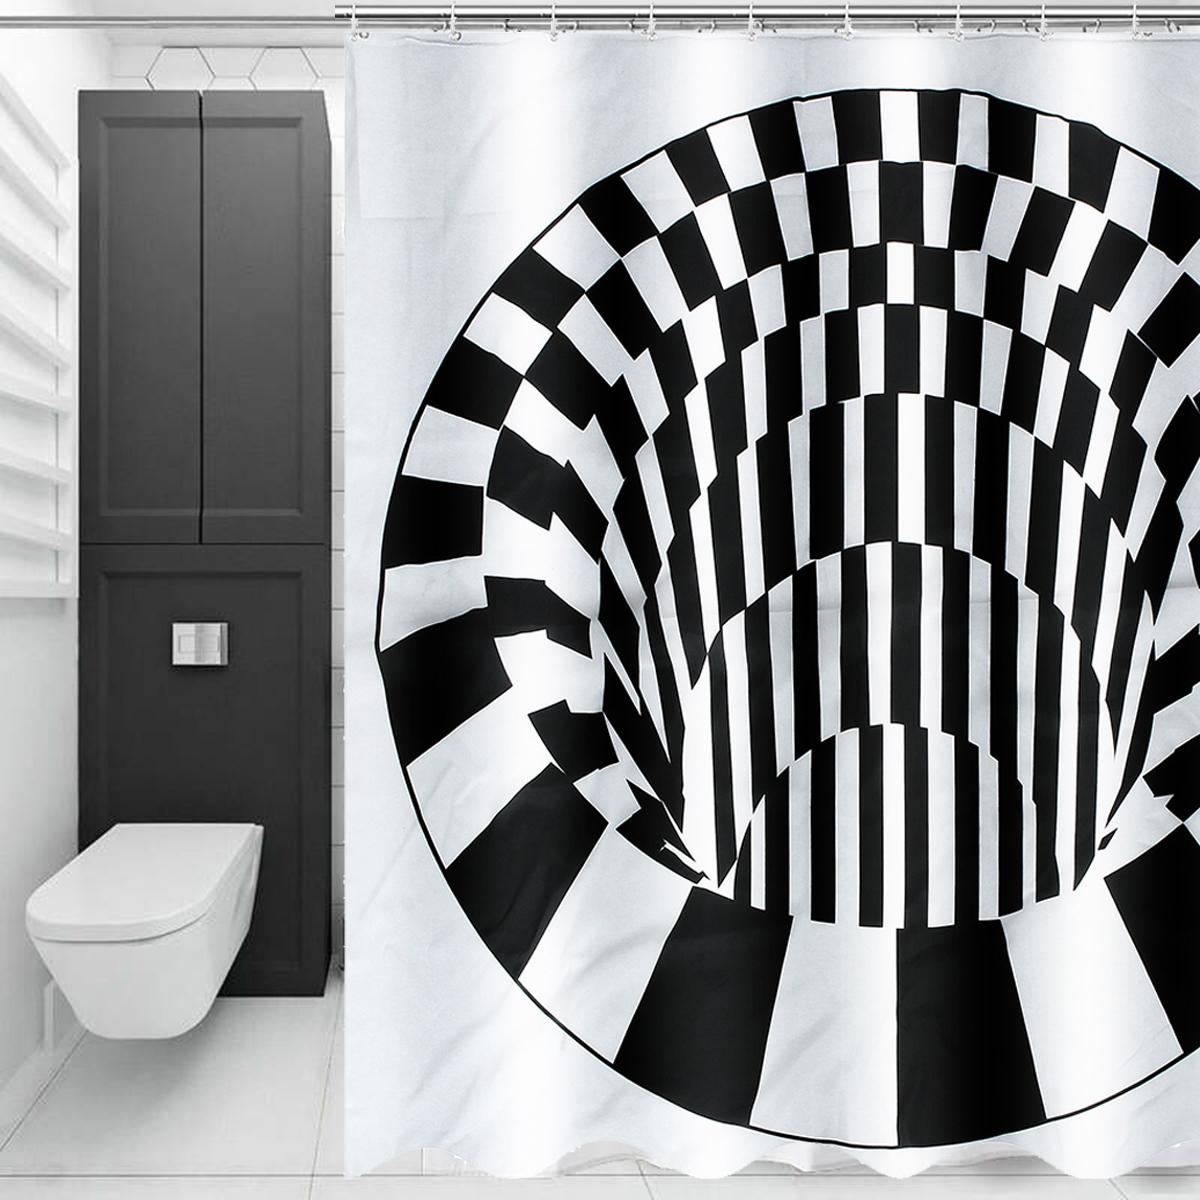 Durable Bathroom Shower Curtain Black White Waterproof Bath Curtain with Hook